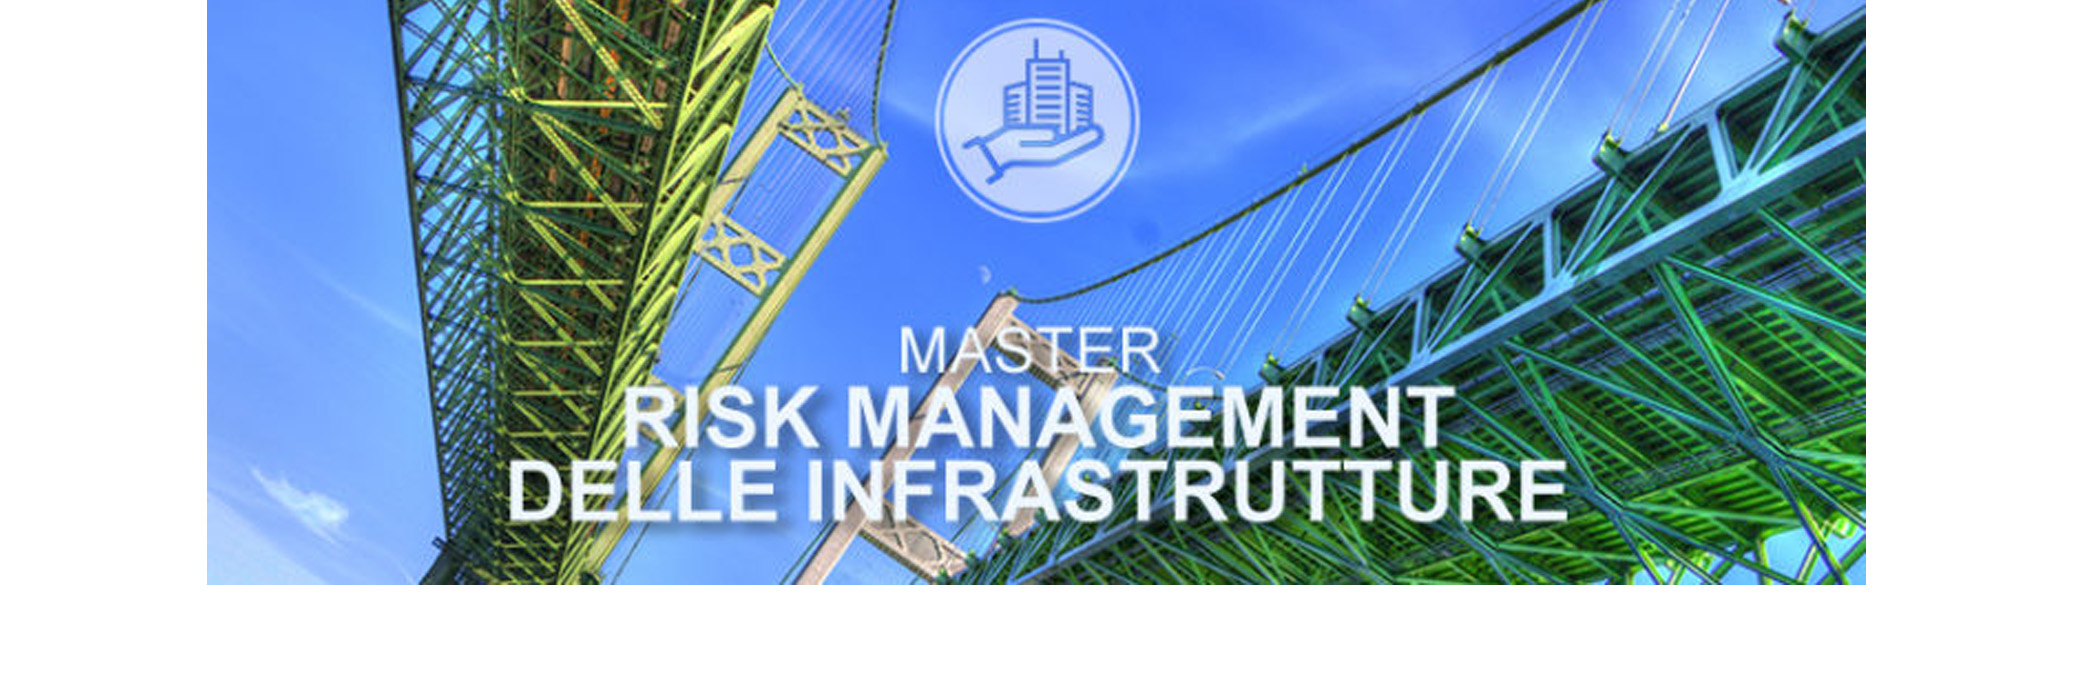 PoliLaPP e il master in Risk Management delle infrastrutture